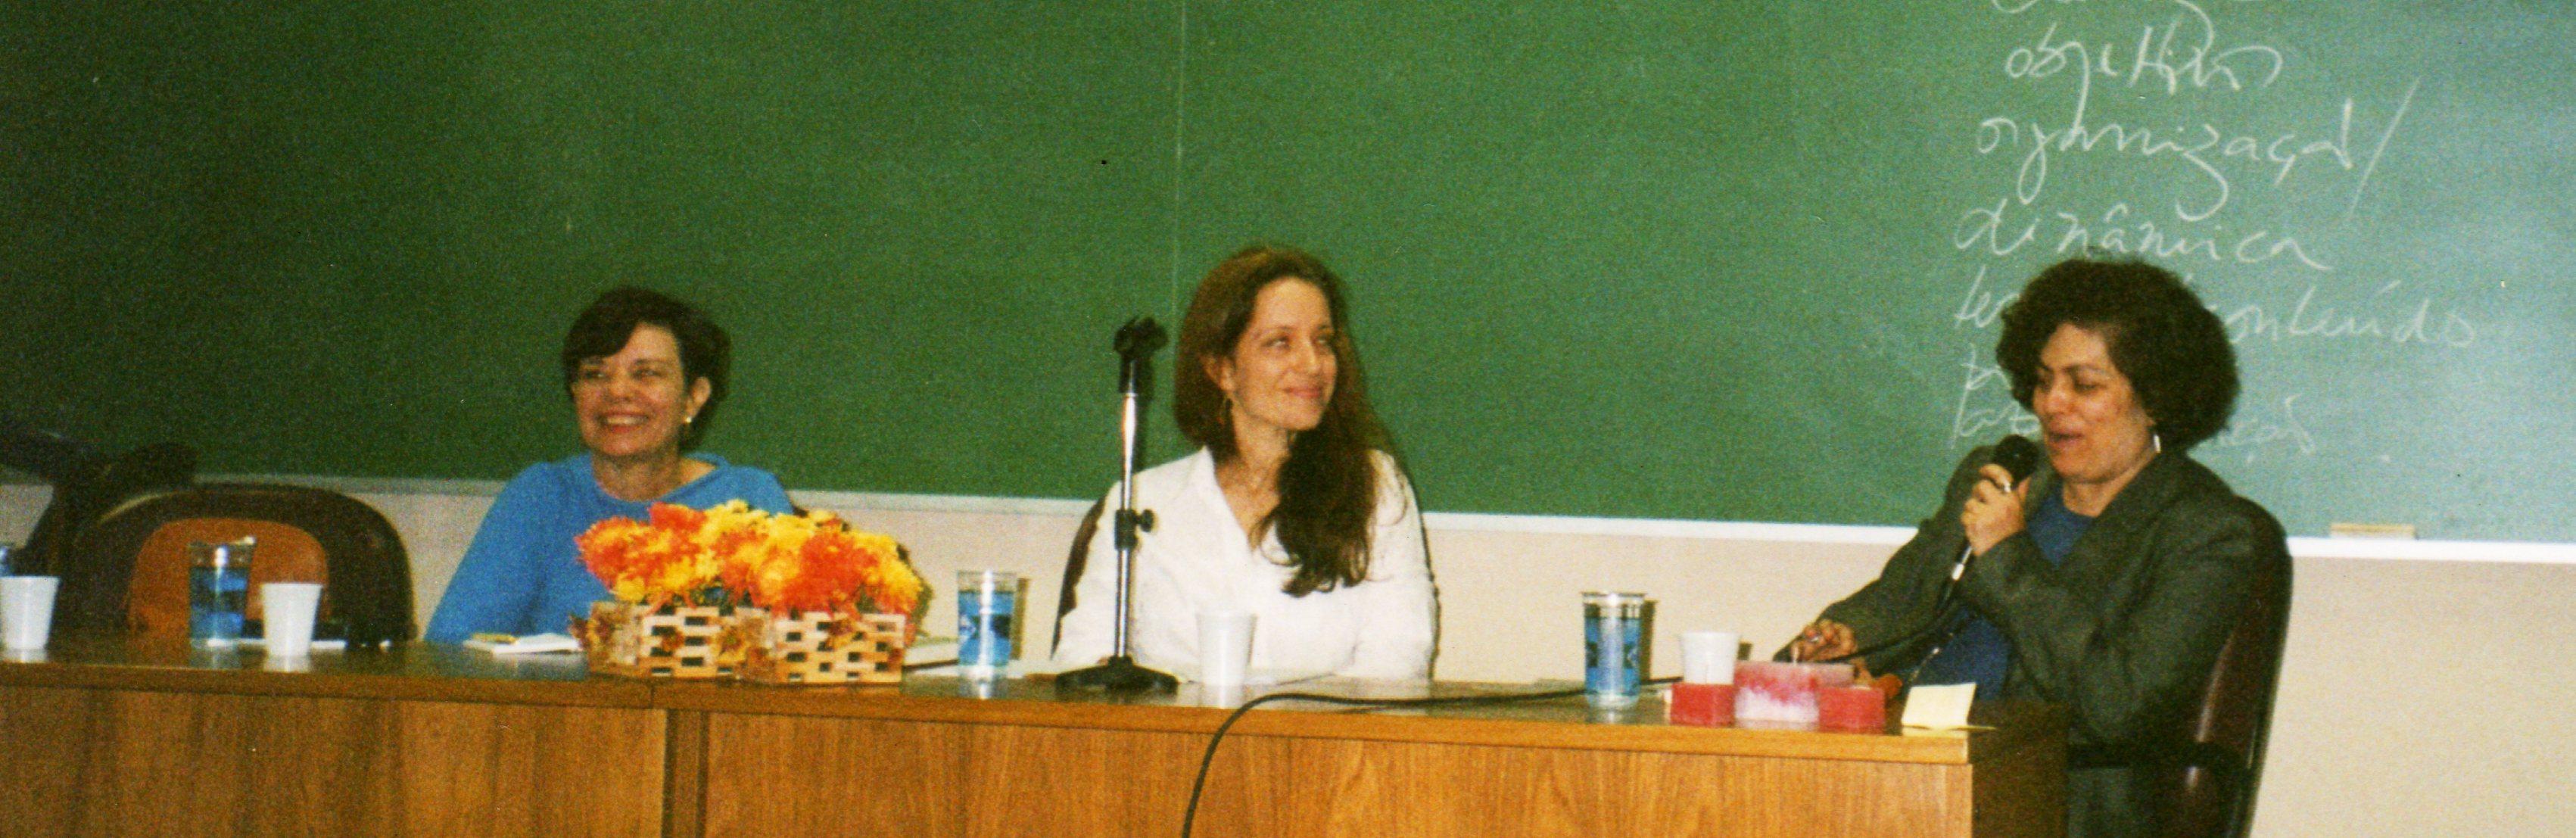 Laboratório Saúde Mental e Psicologia Clínica Social 20 anos 012